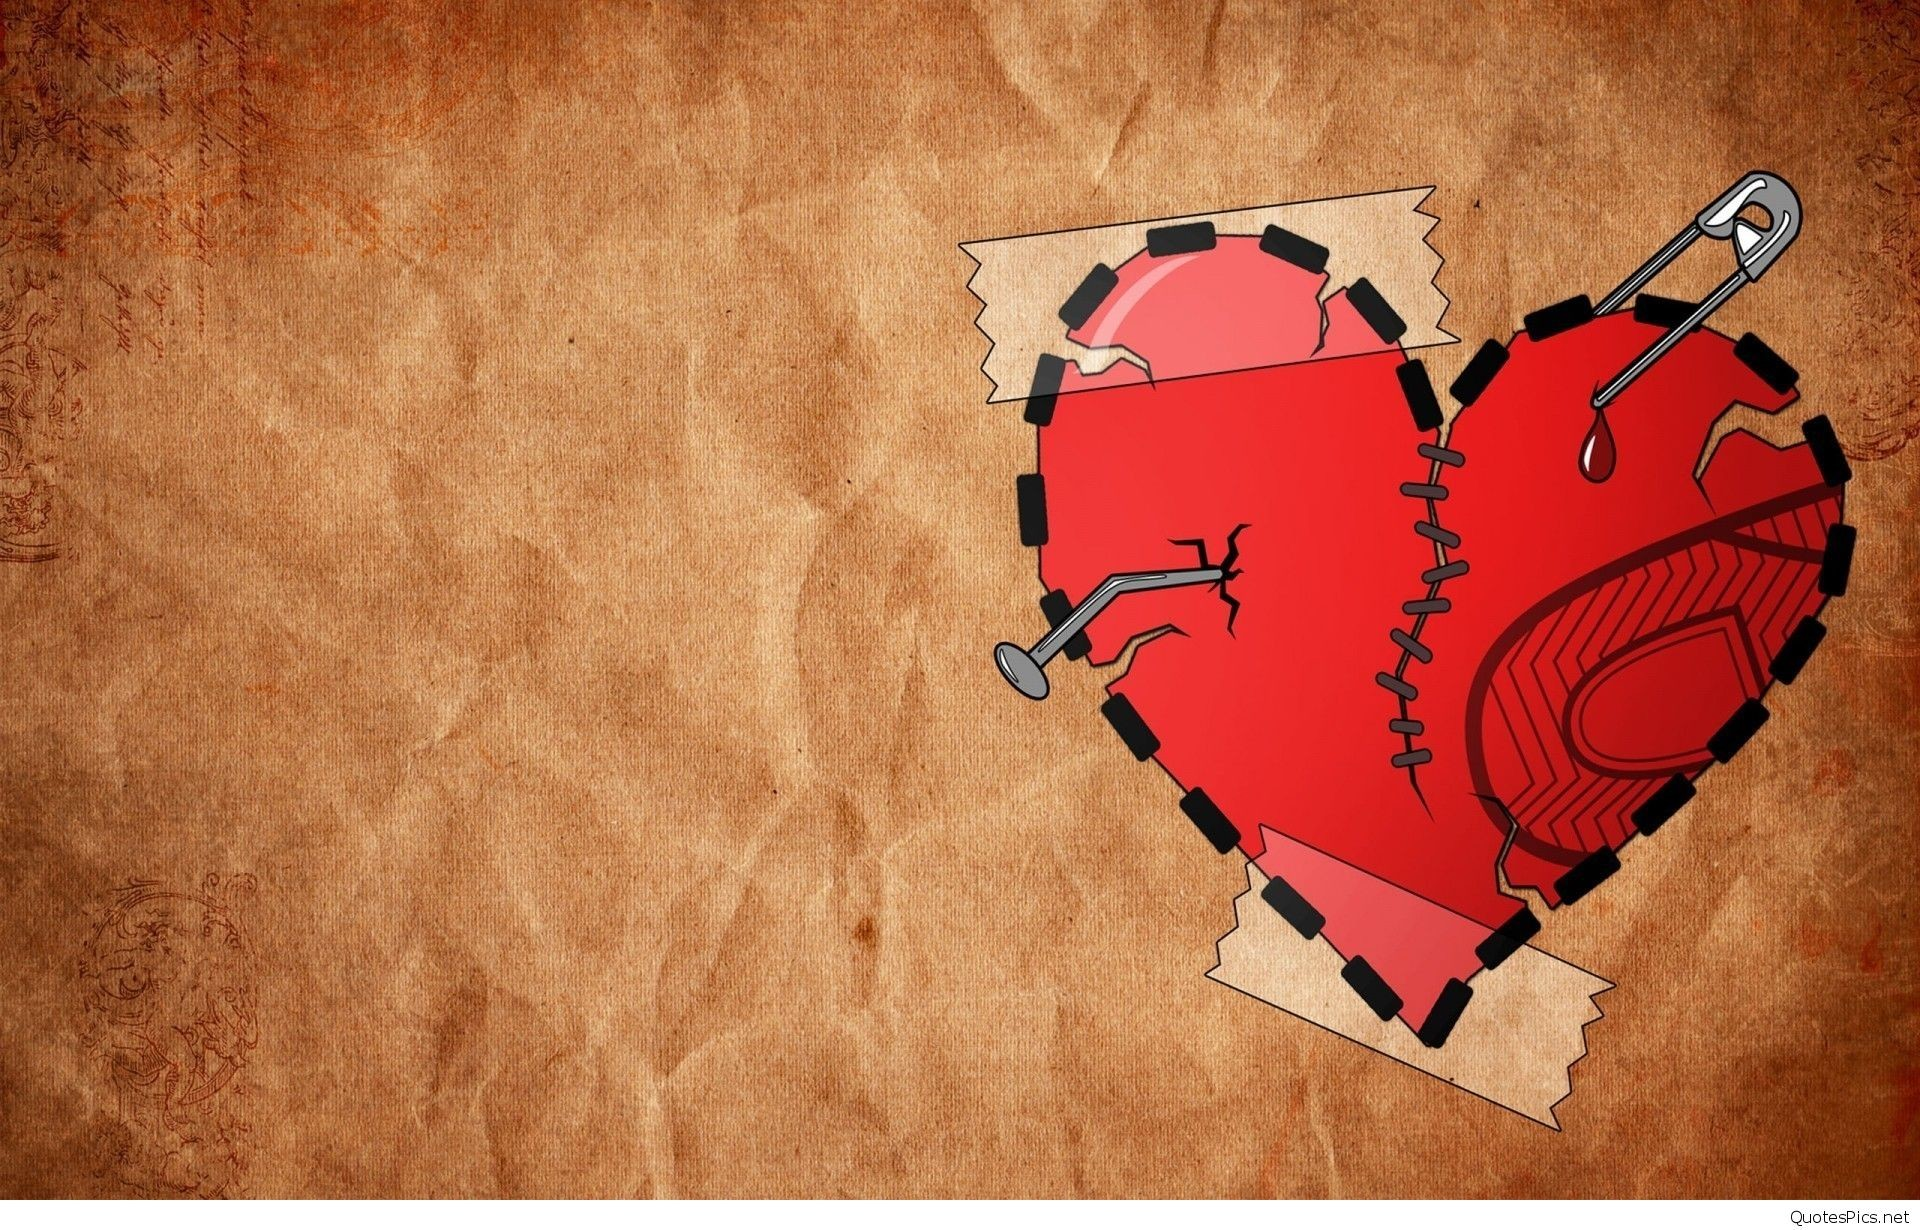 3d Broken Hearts Wallpaper Heartbreak Wallpaper 183 ① Wallpapertag